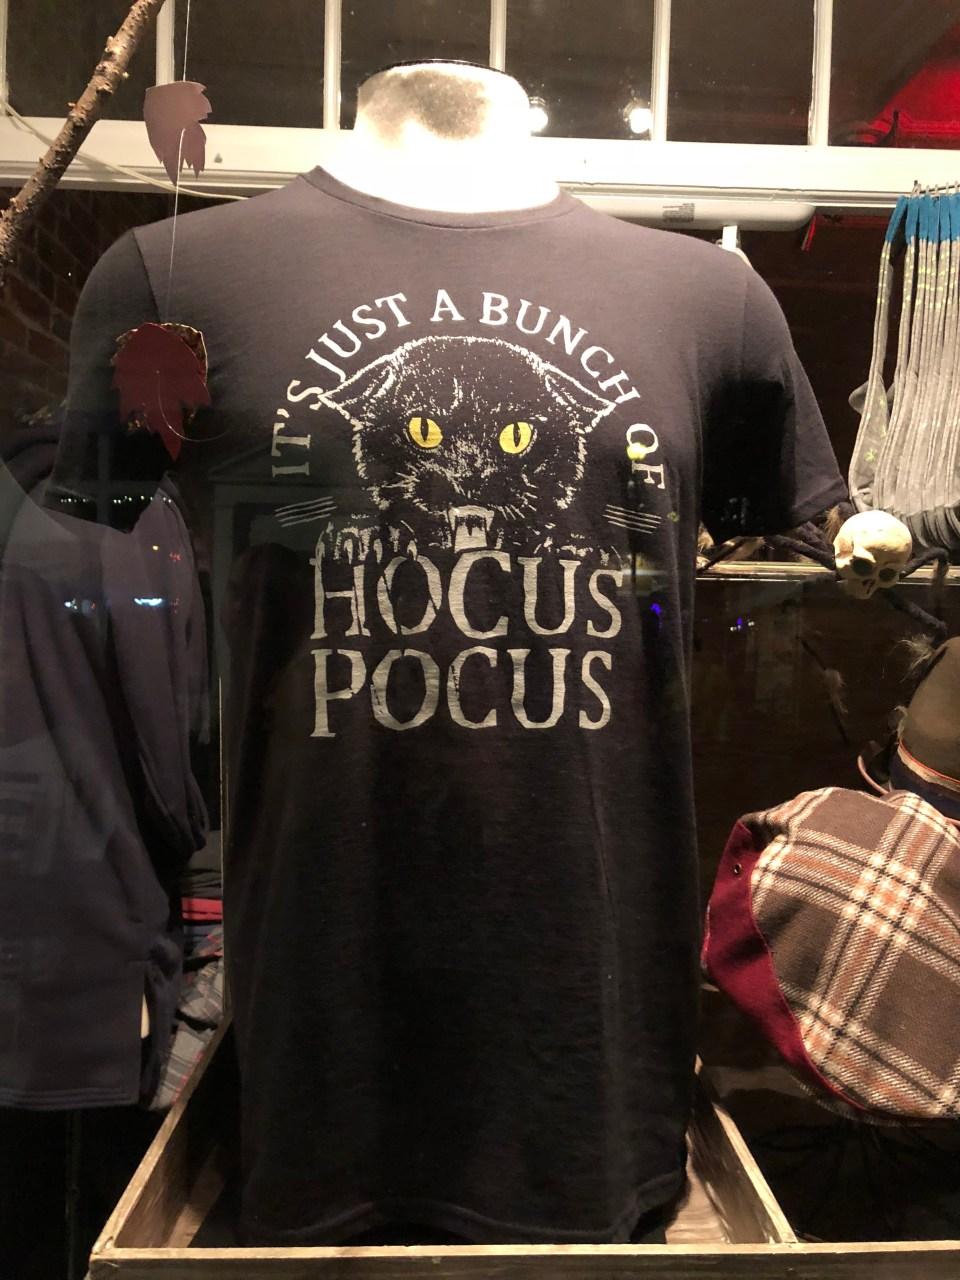 Hocus Pocus TShirt - Salem